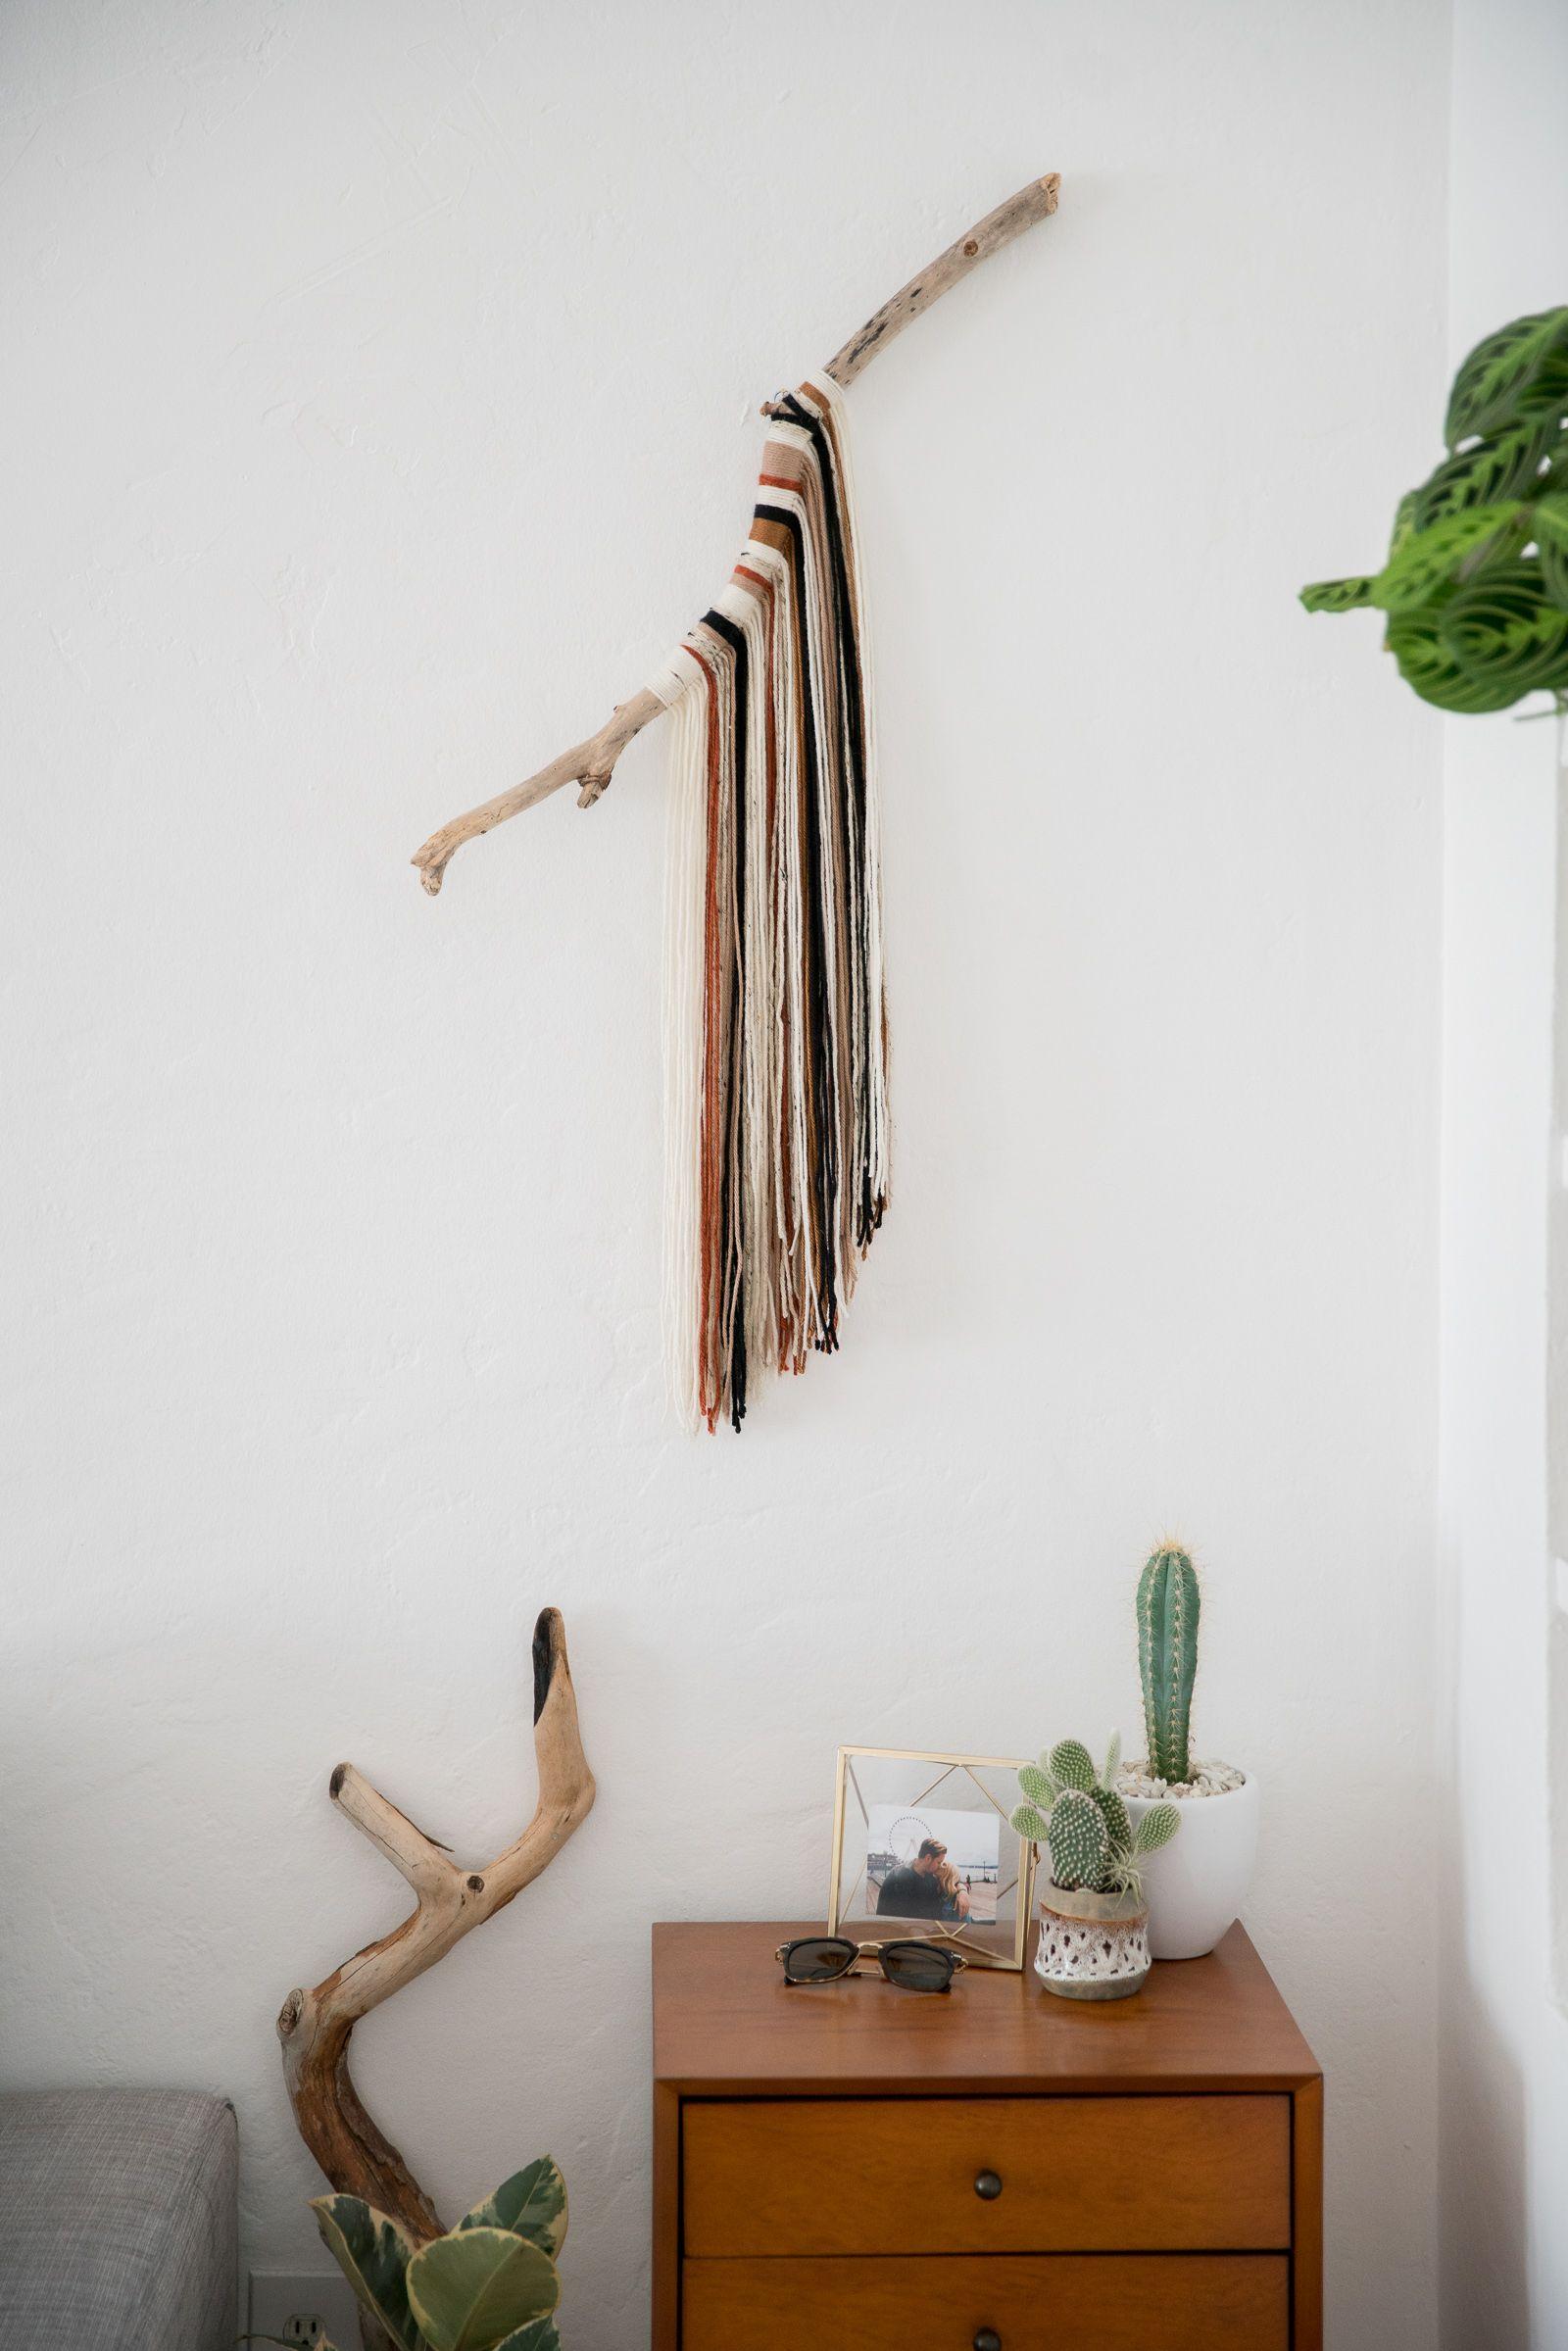 Pin by YN Wang on life   Decor, Home decor, Coat rack